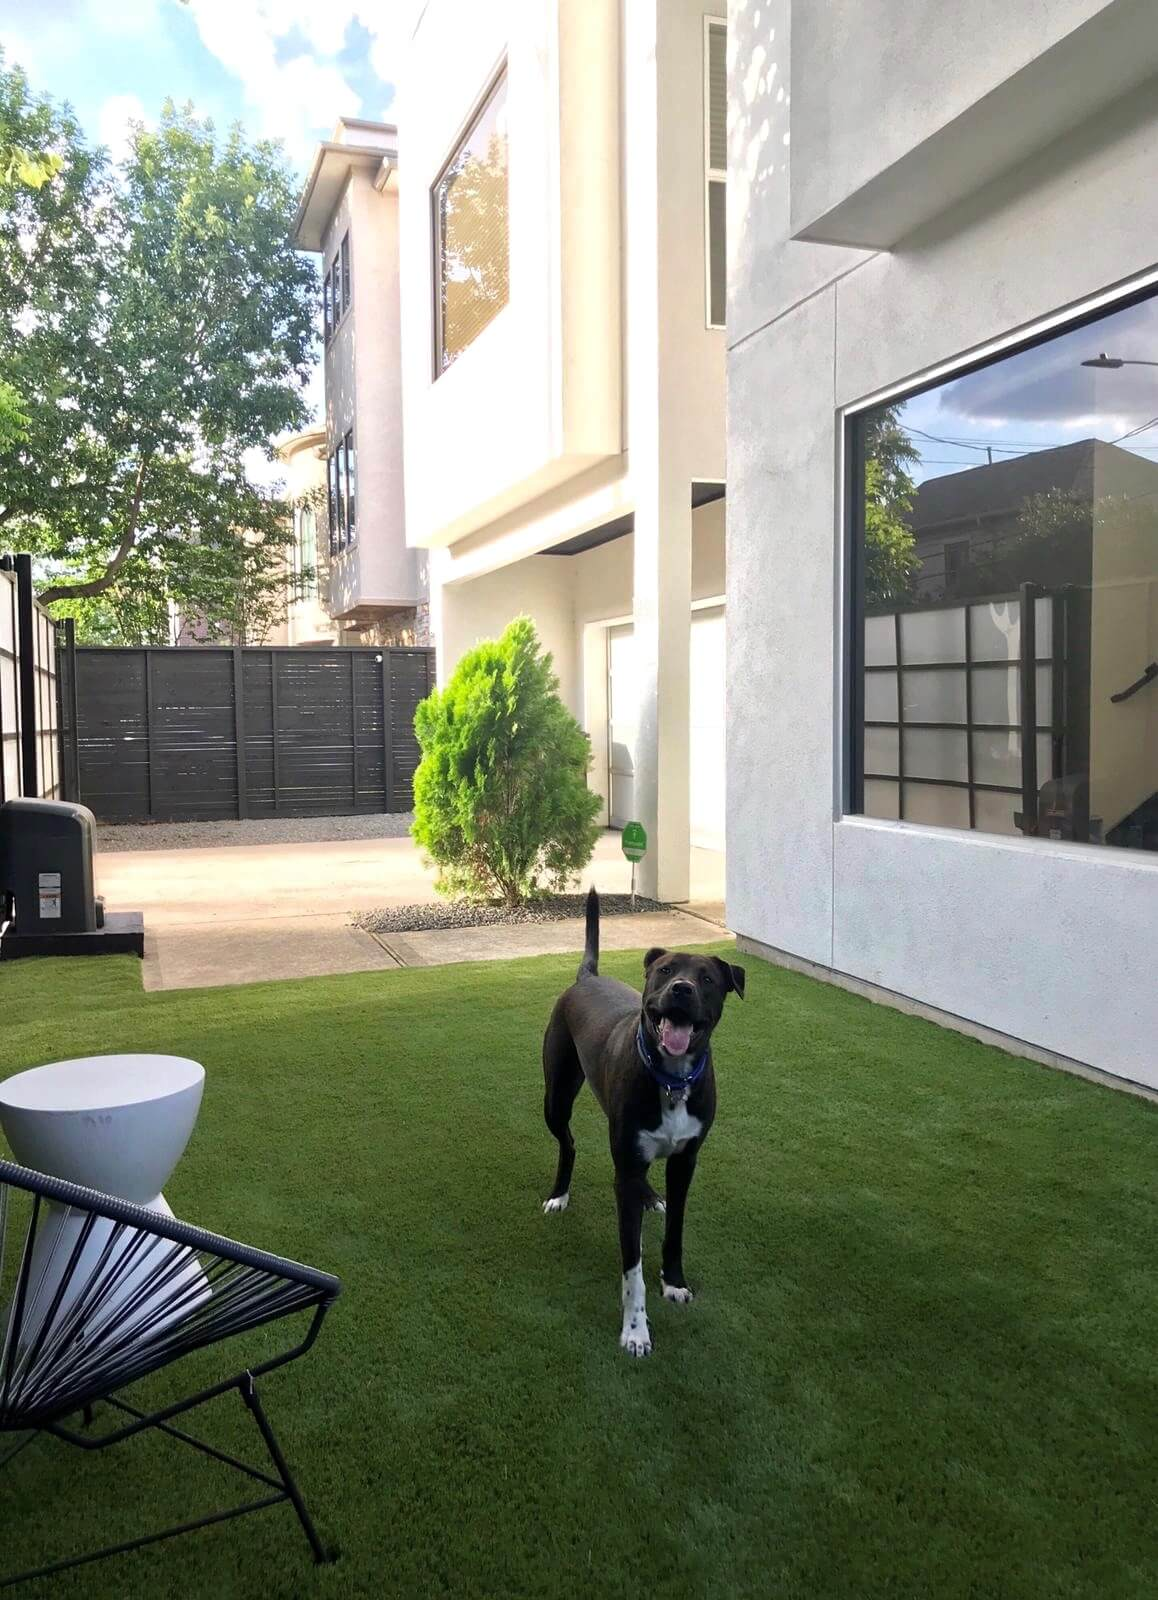 Artificial Grass for Dogs - Texas Fake Grass